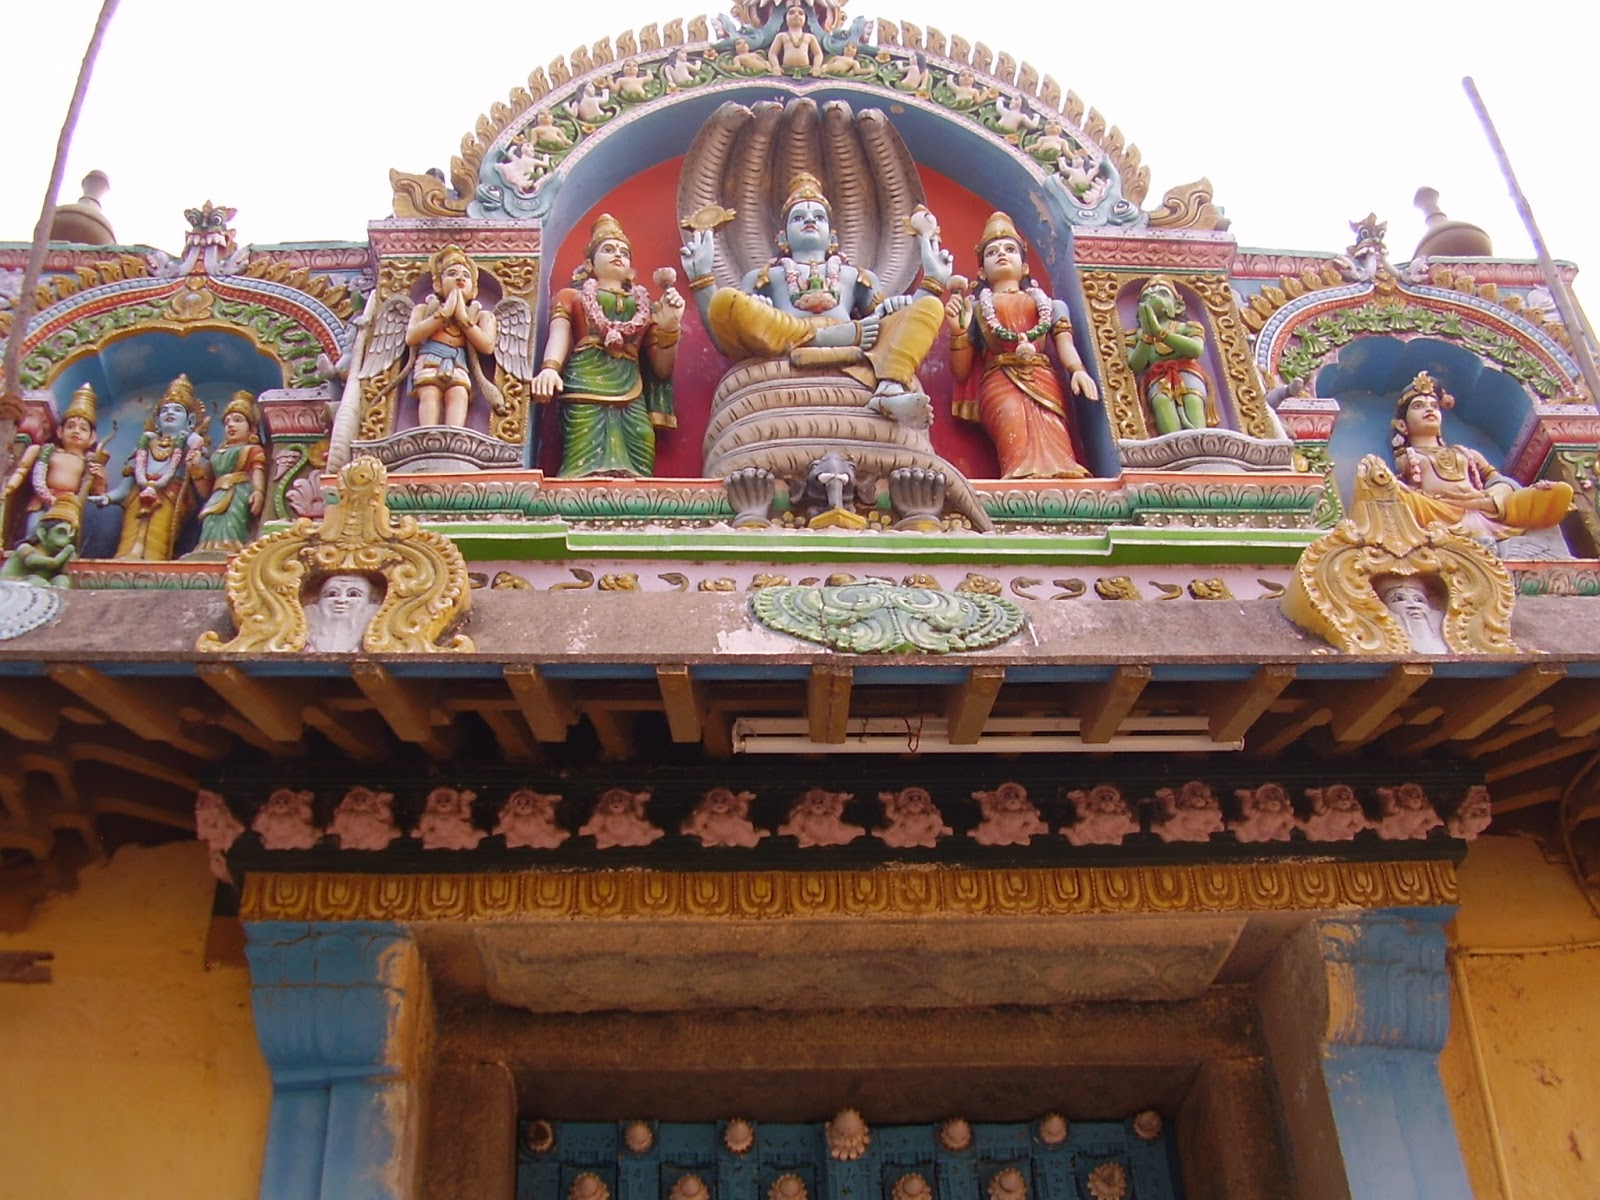 Sri Kuralappan Perumal Temple (Thiruvanparisaram) Kerala - Divya Desam 84